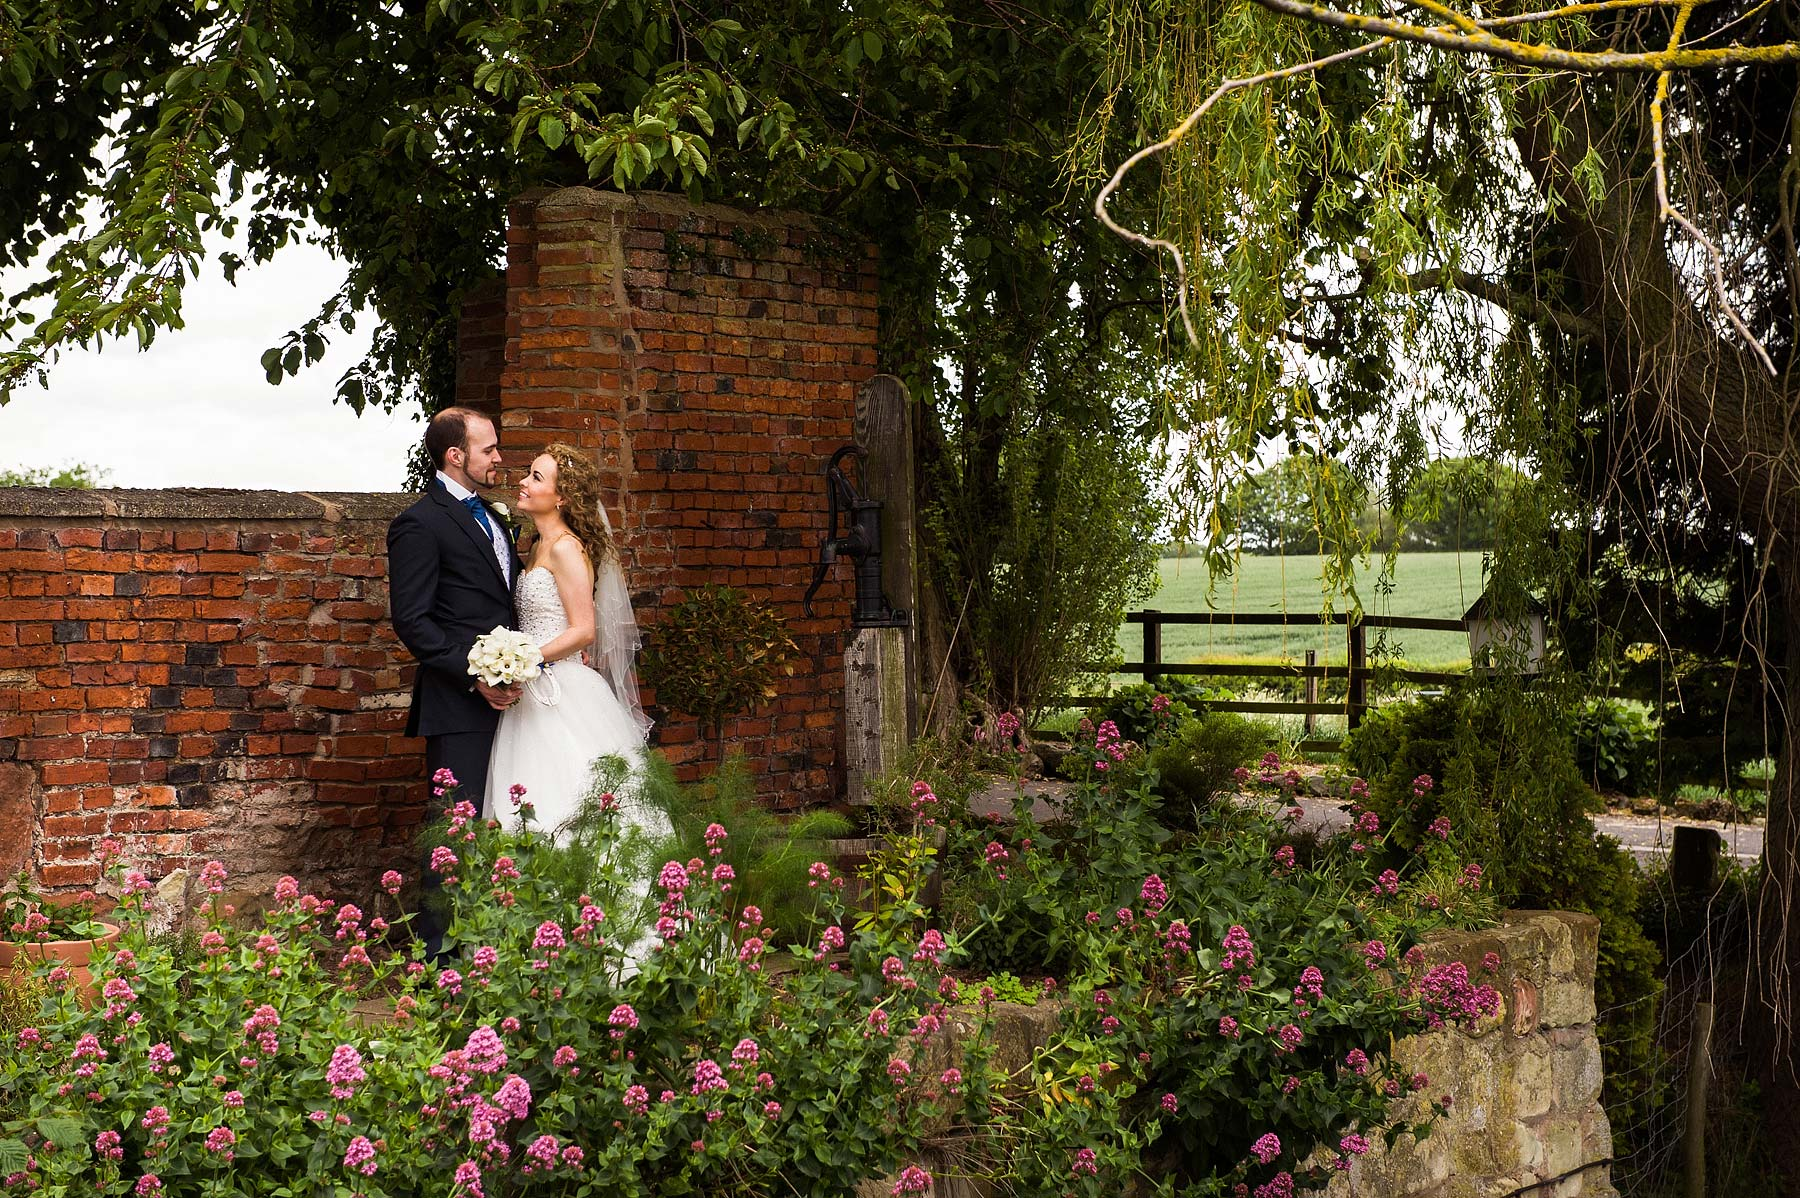 albright-hussey-manor-wedding-photographers-049